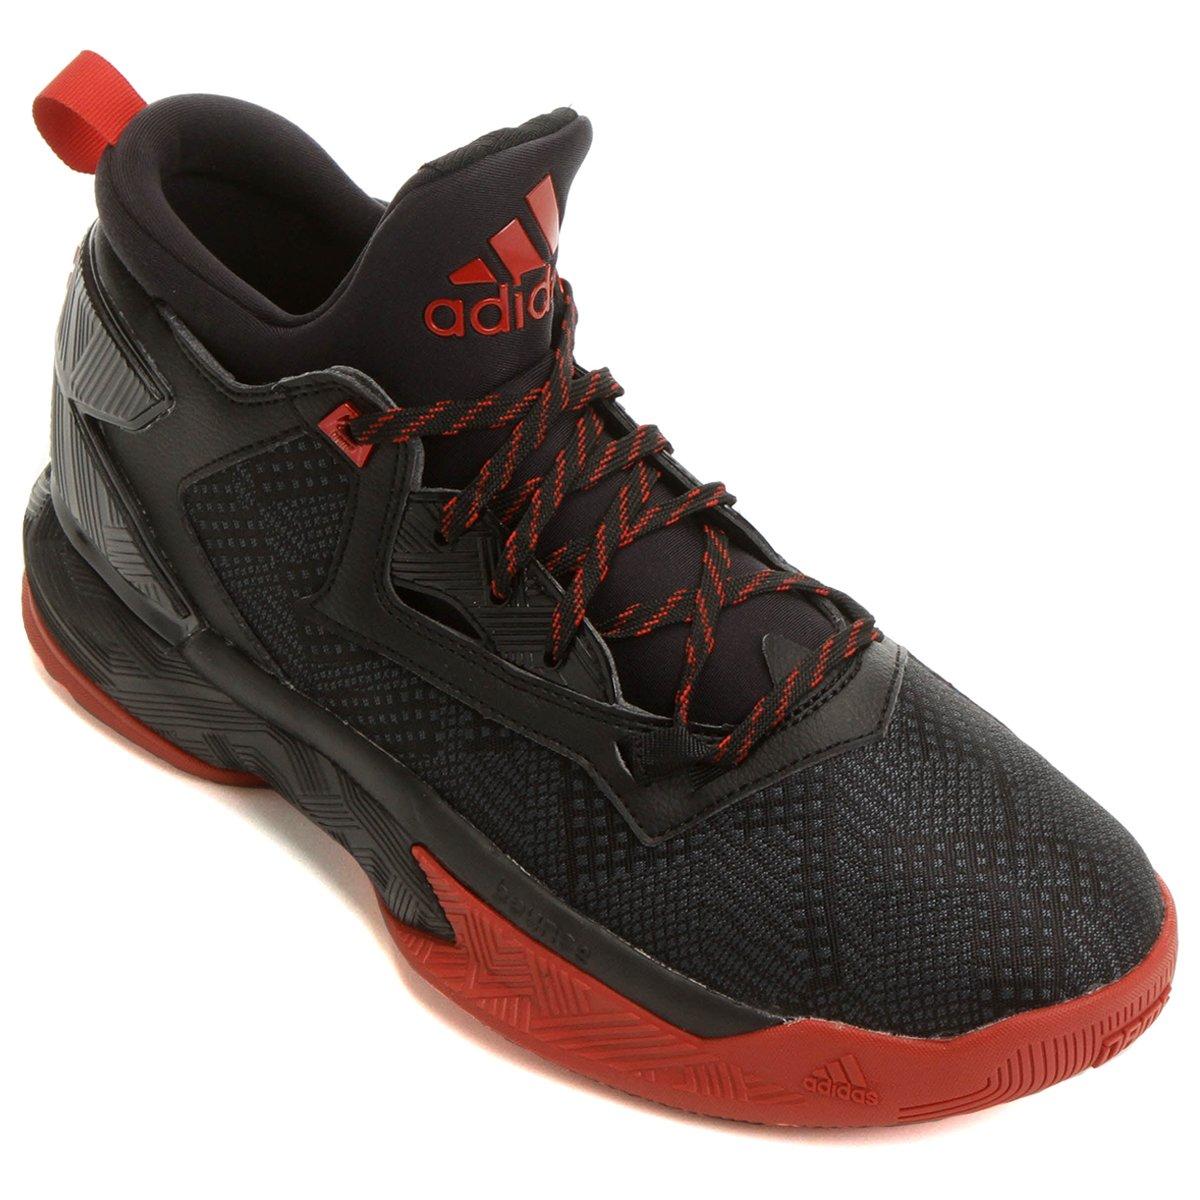 f7ff4352341fe Tênis Adidas Damian Lillard 2 Masculino - Compre Agora